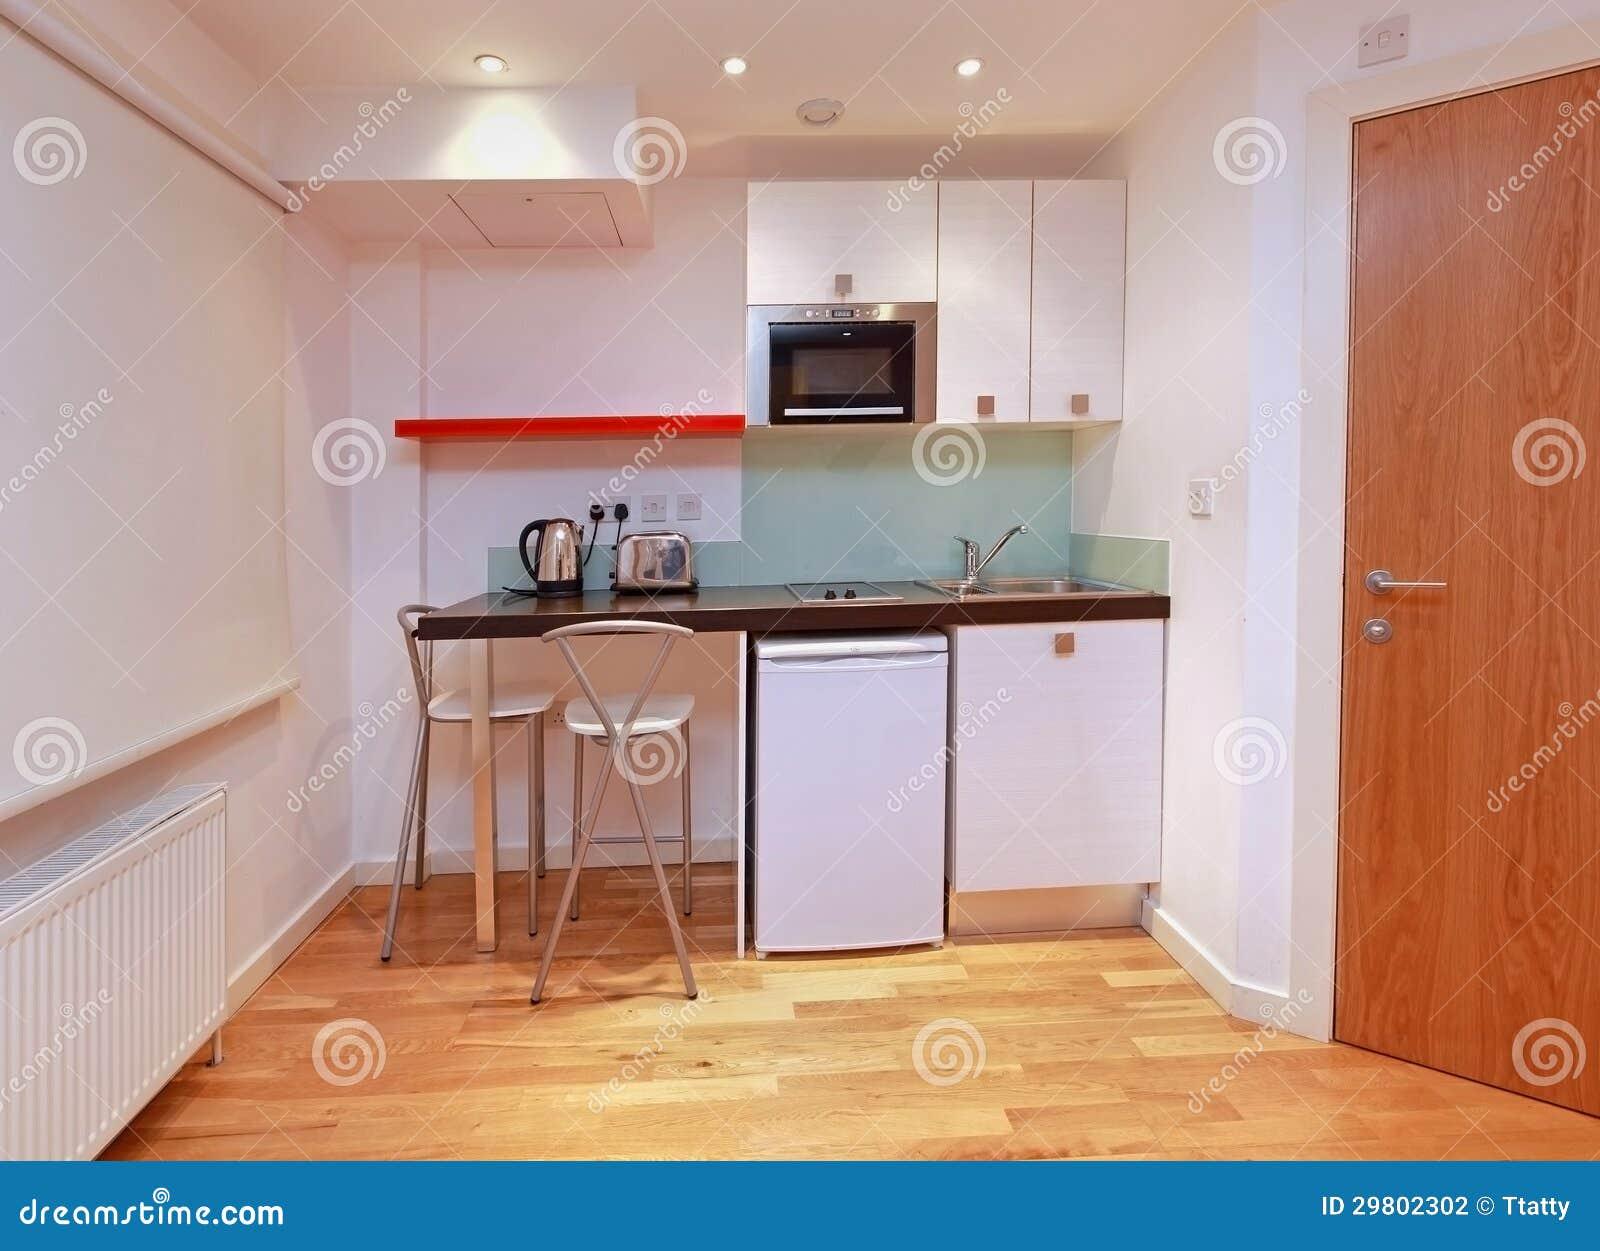 cucina moderna usata: scopri di pi. carrello da cucina nuovo ... - Cucina Moderna Usata